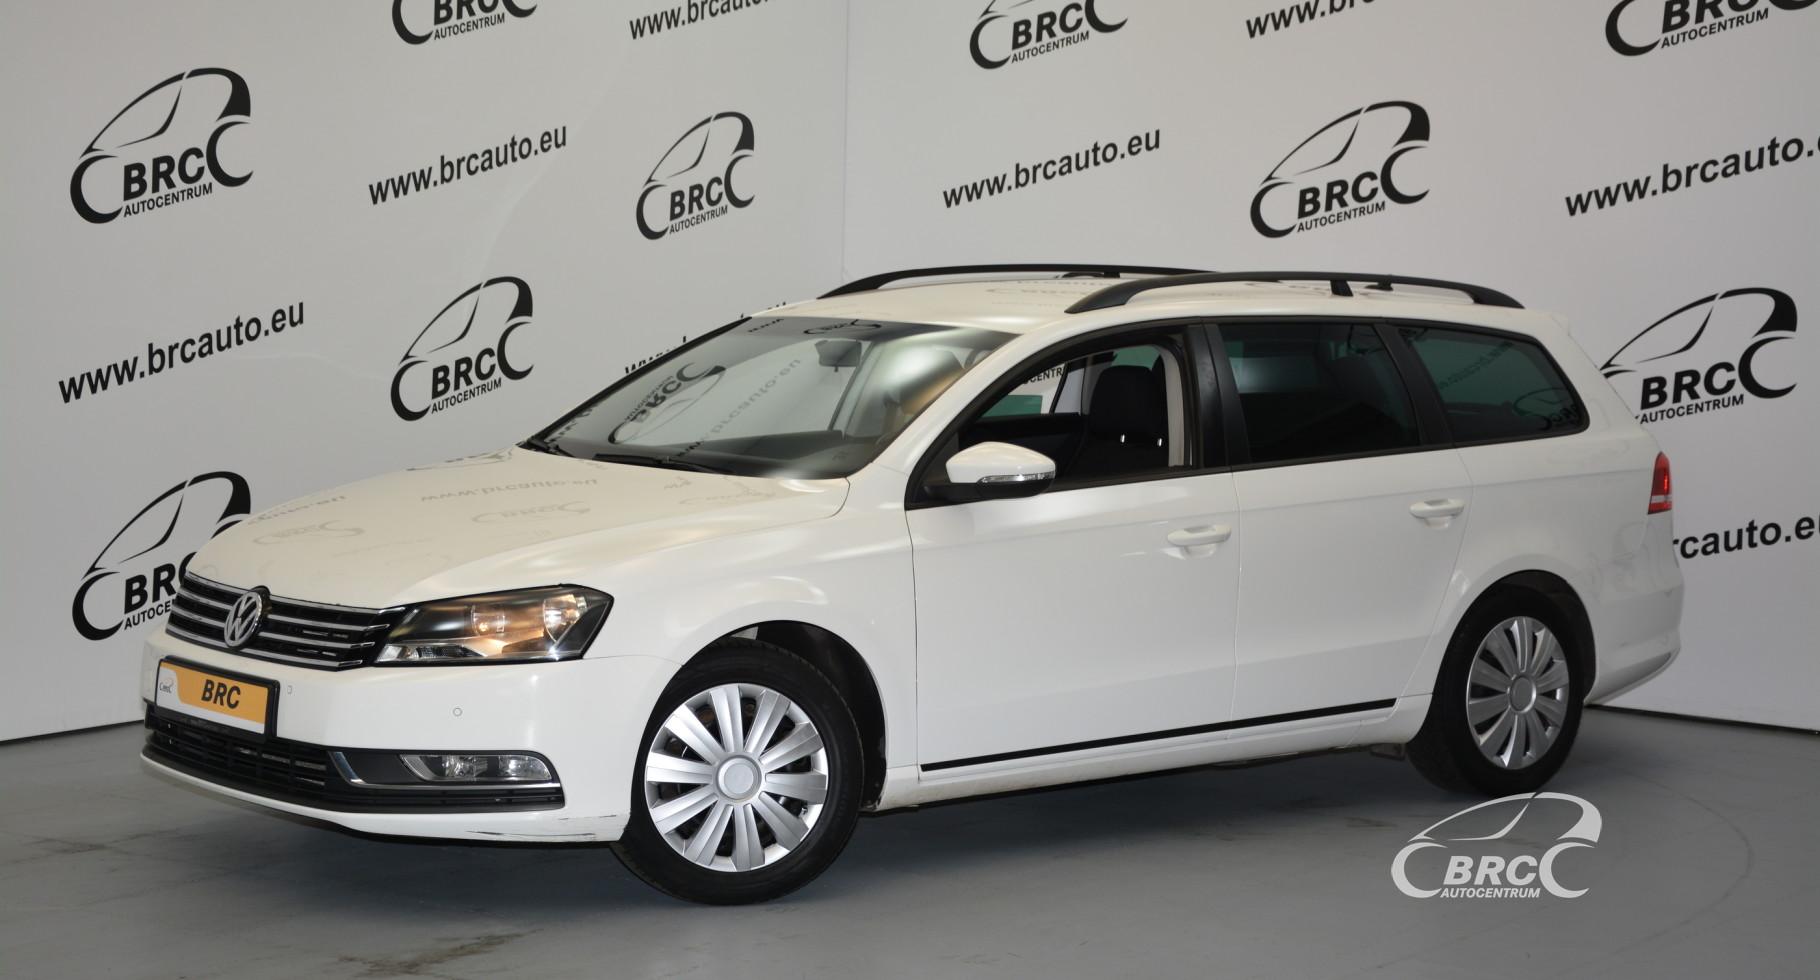 Volkswagen Passat 1.6 TDI BlueMotion Variant